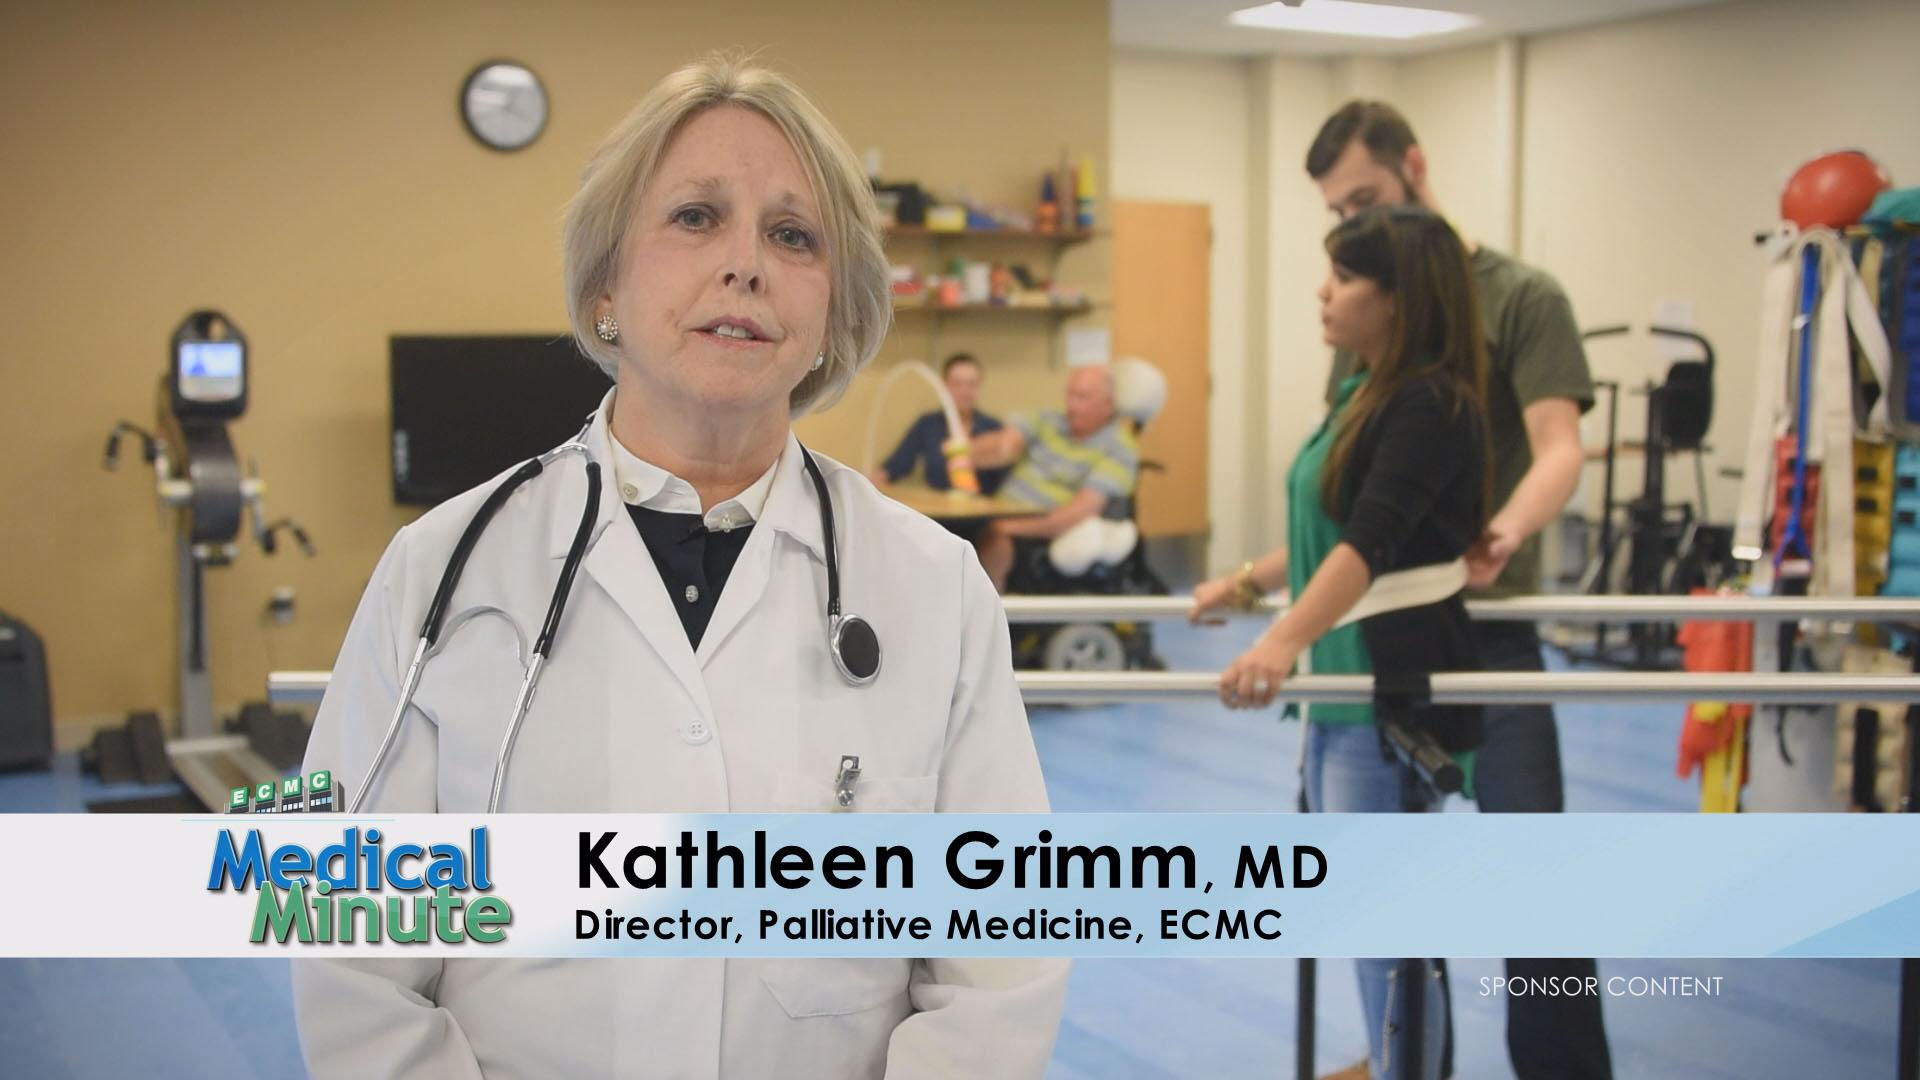 ECMC Medical Minute Dr.Grimm PalliativeCare 03.20.17